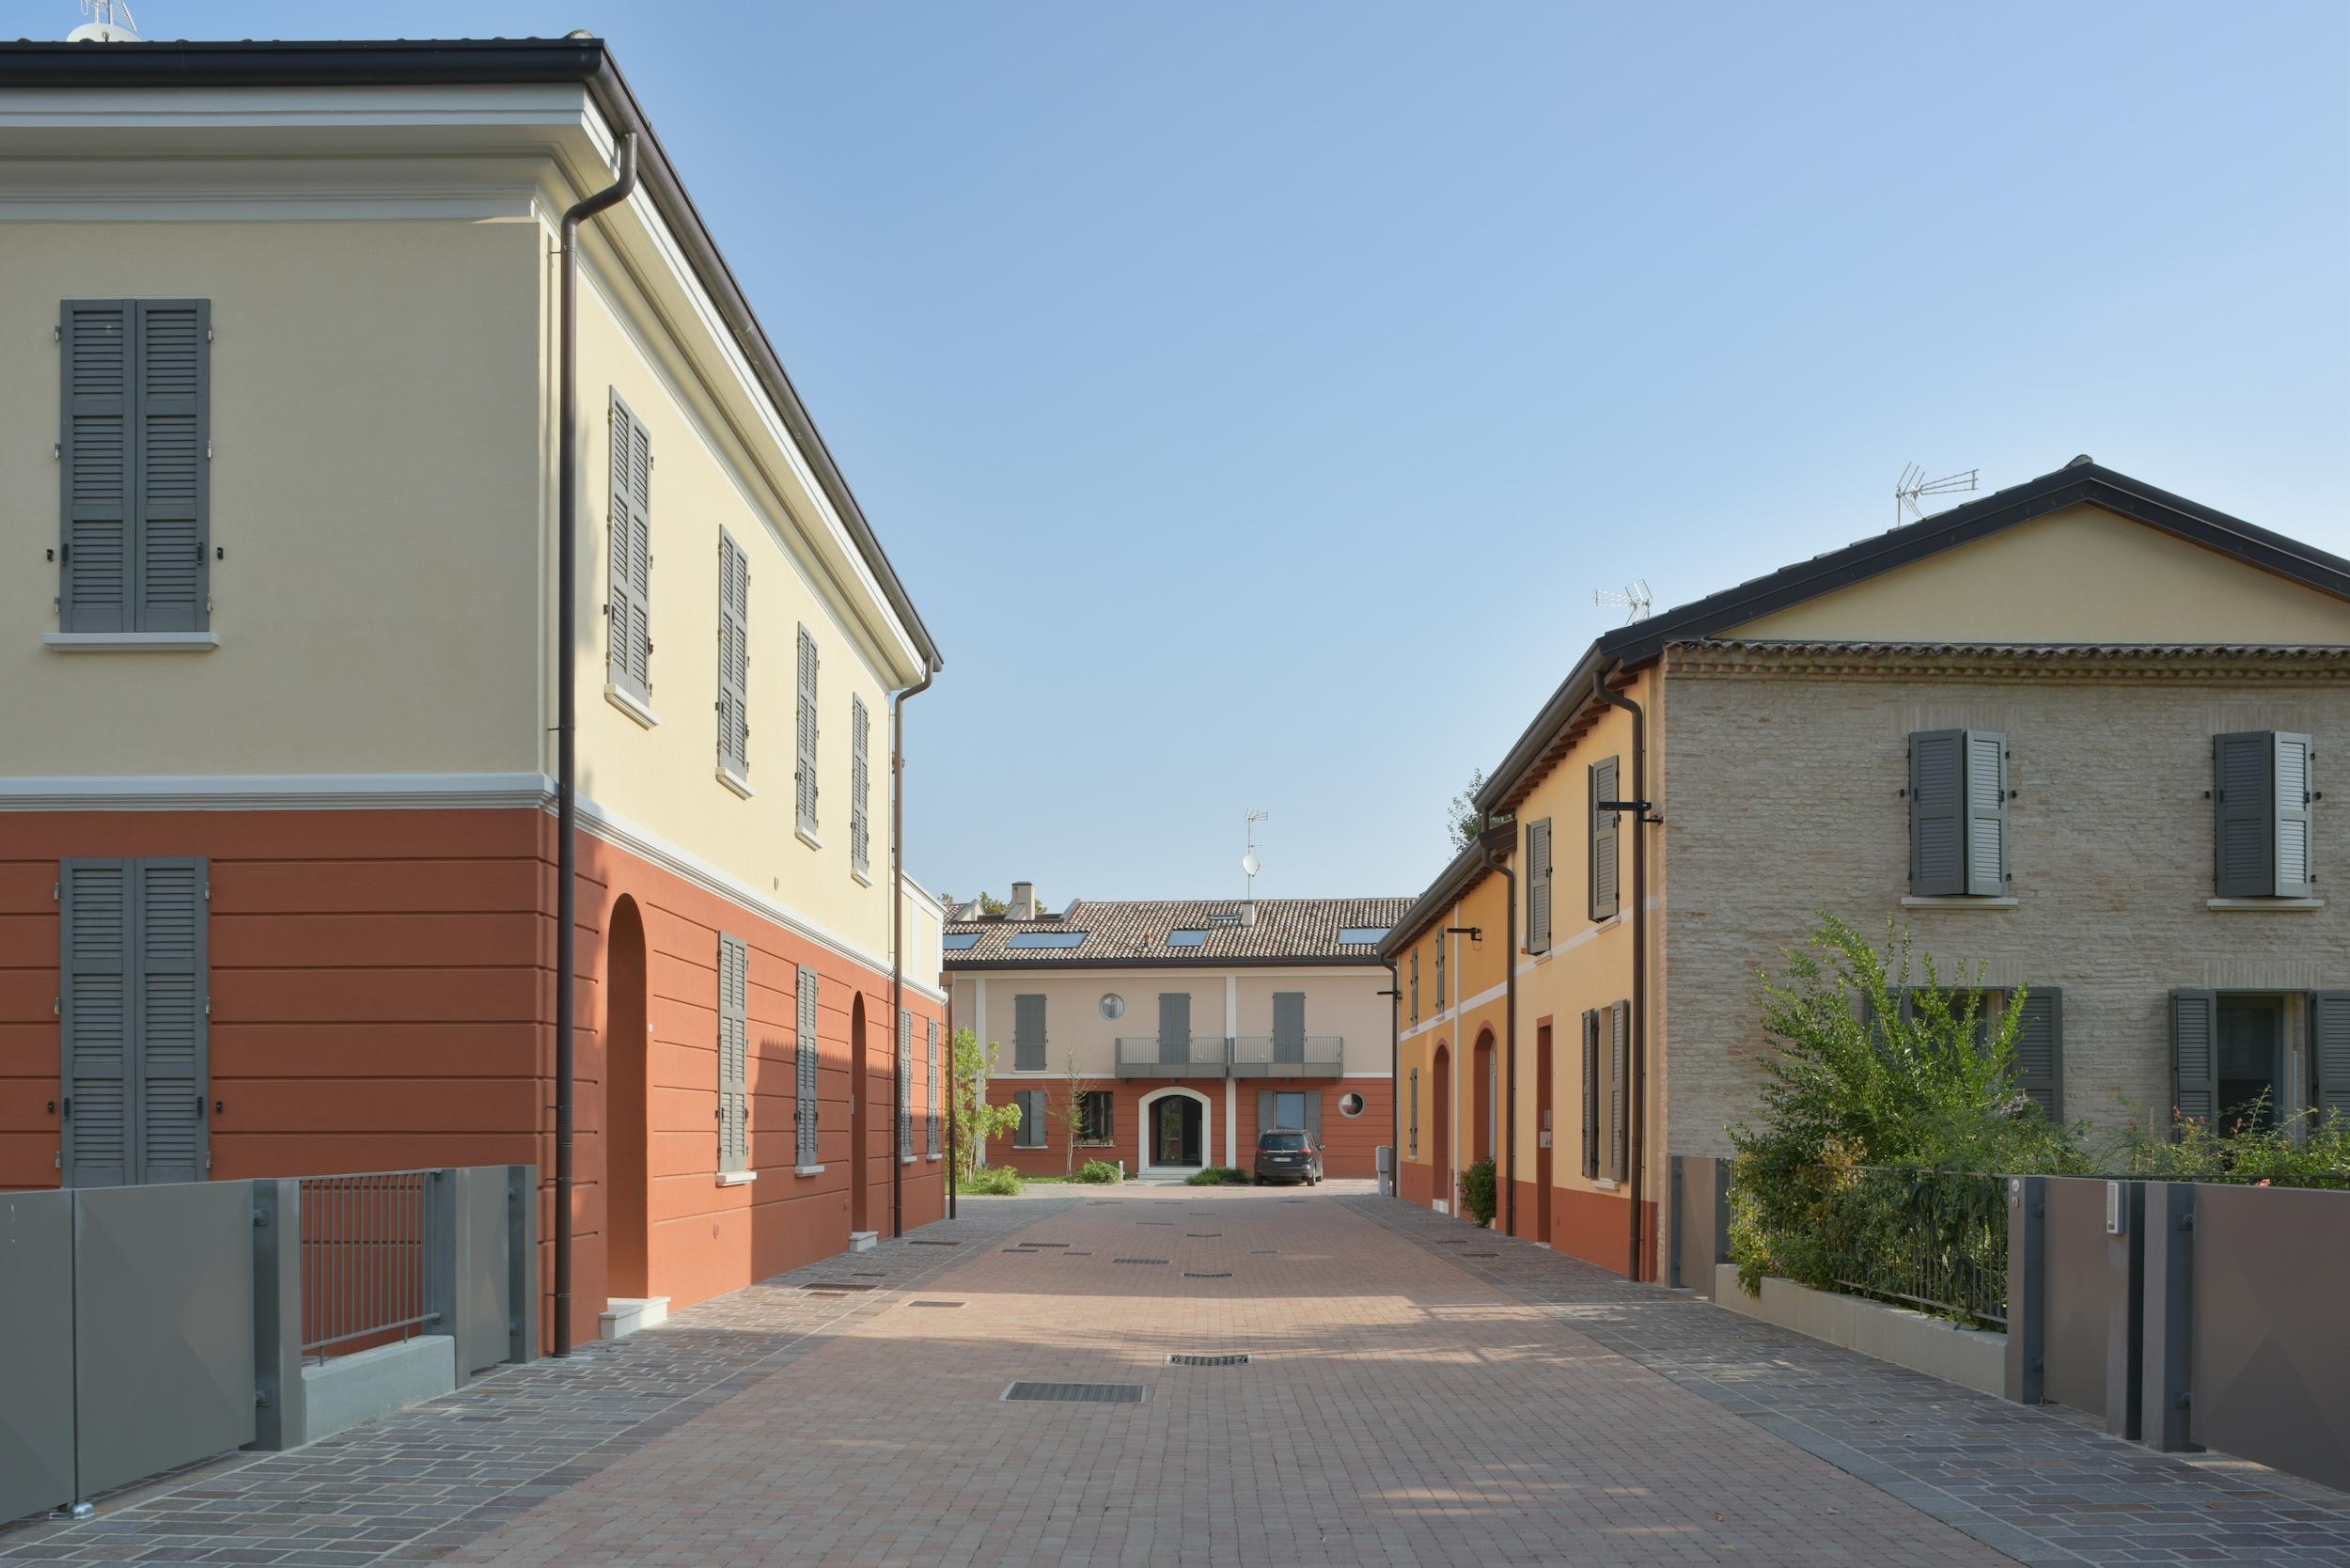 1295 Studio Bacchi Architetti Santa Chiara Residenziale